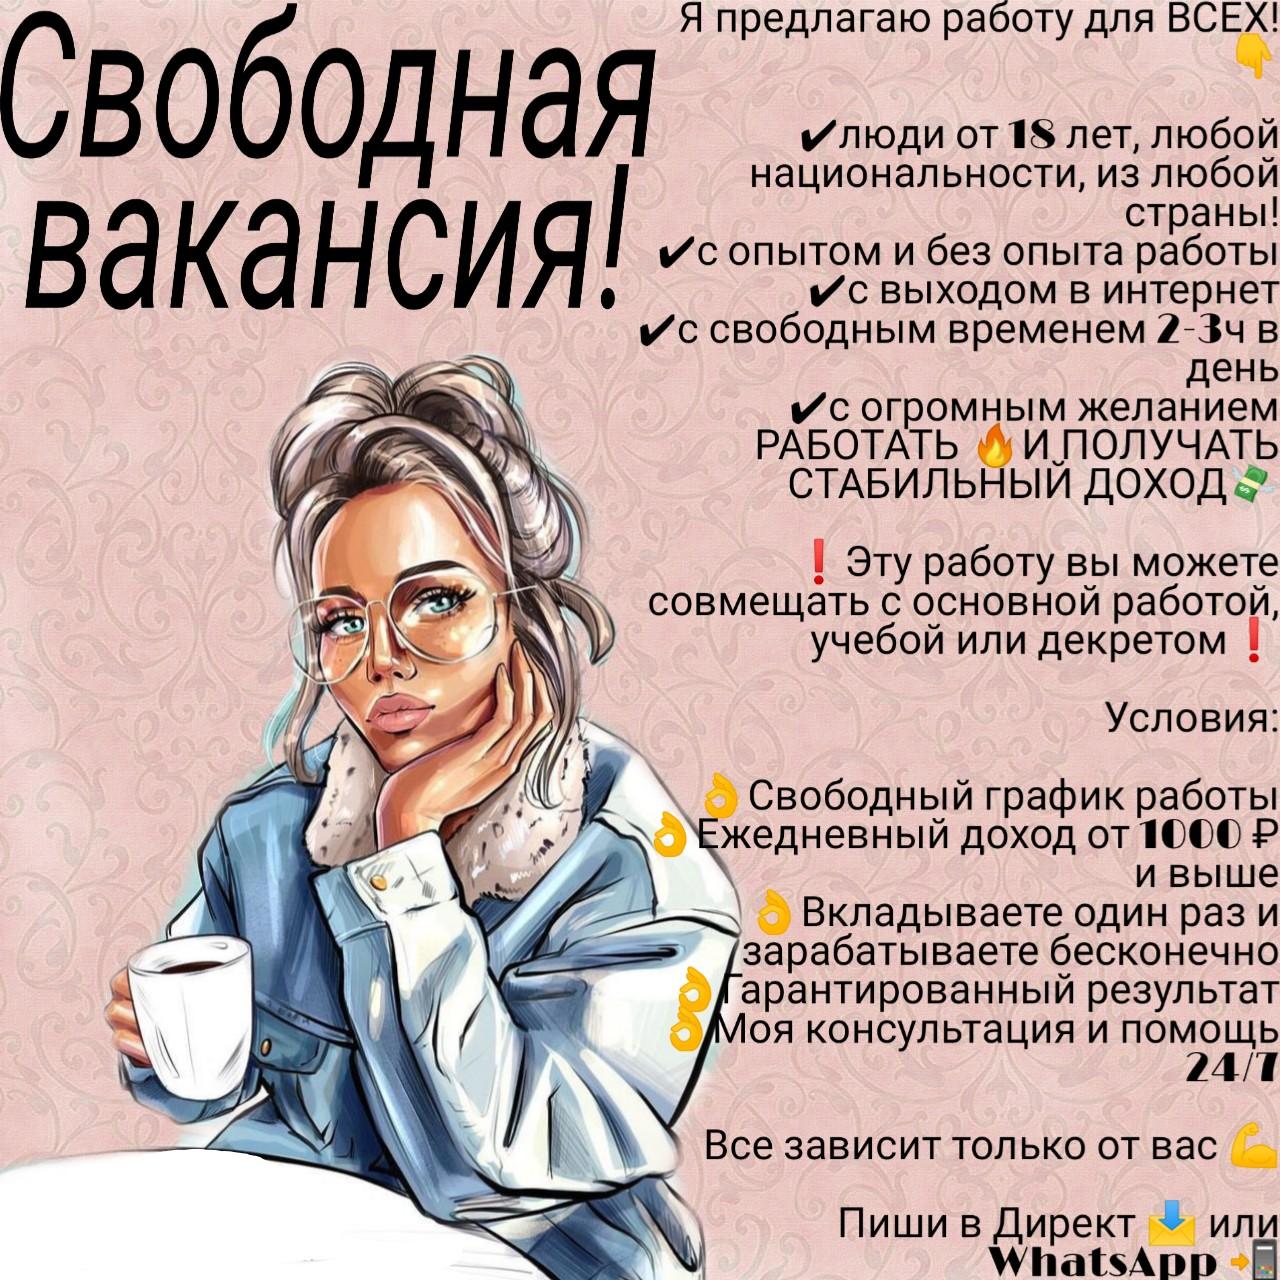 Фрилансер в спб вакансии журналист копирайтер удалённо работа